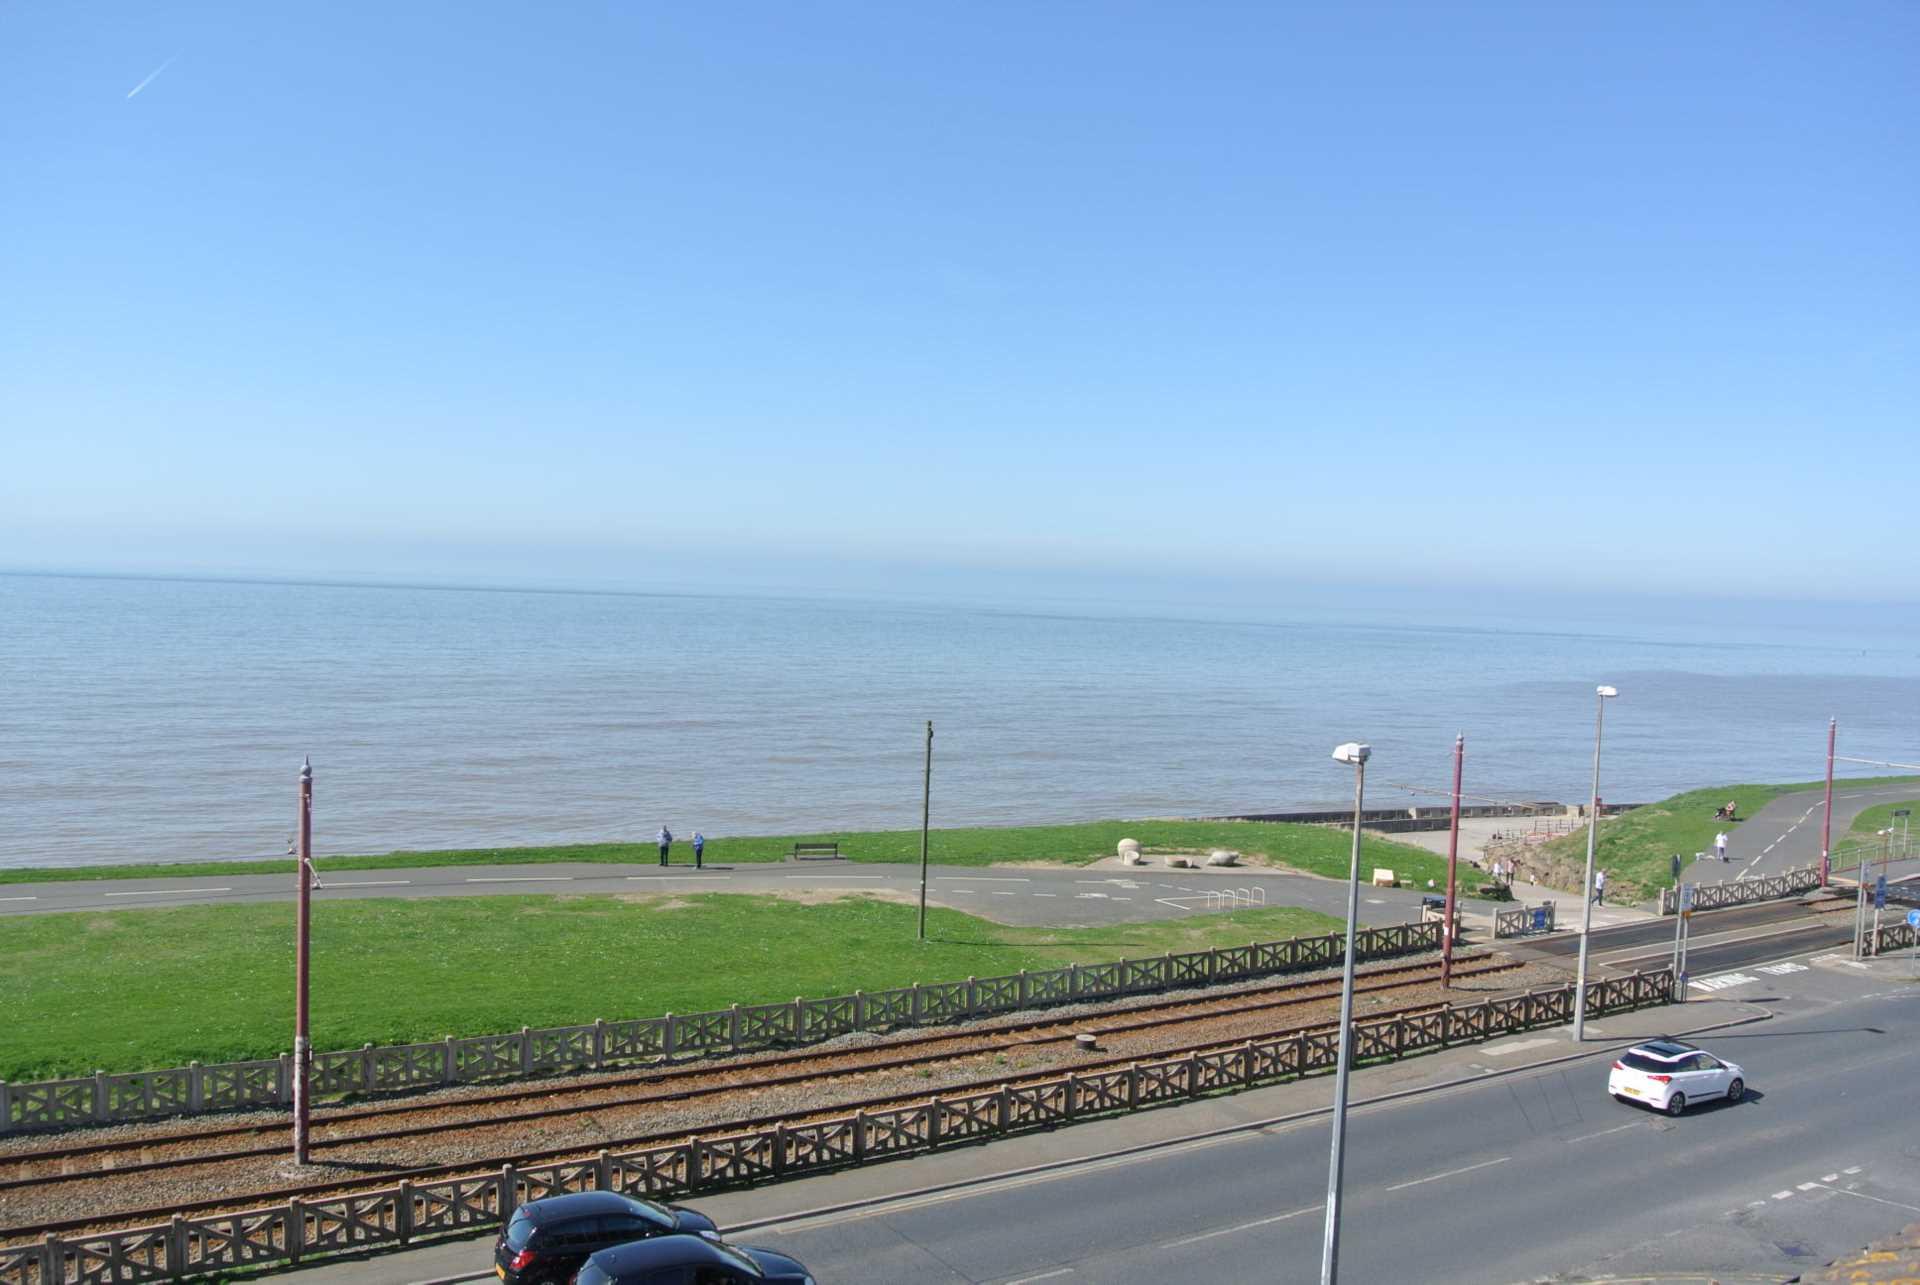 Dales View, Queens Promenade, Blackpool, FY2 9AB, Image 4